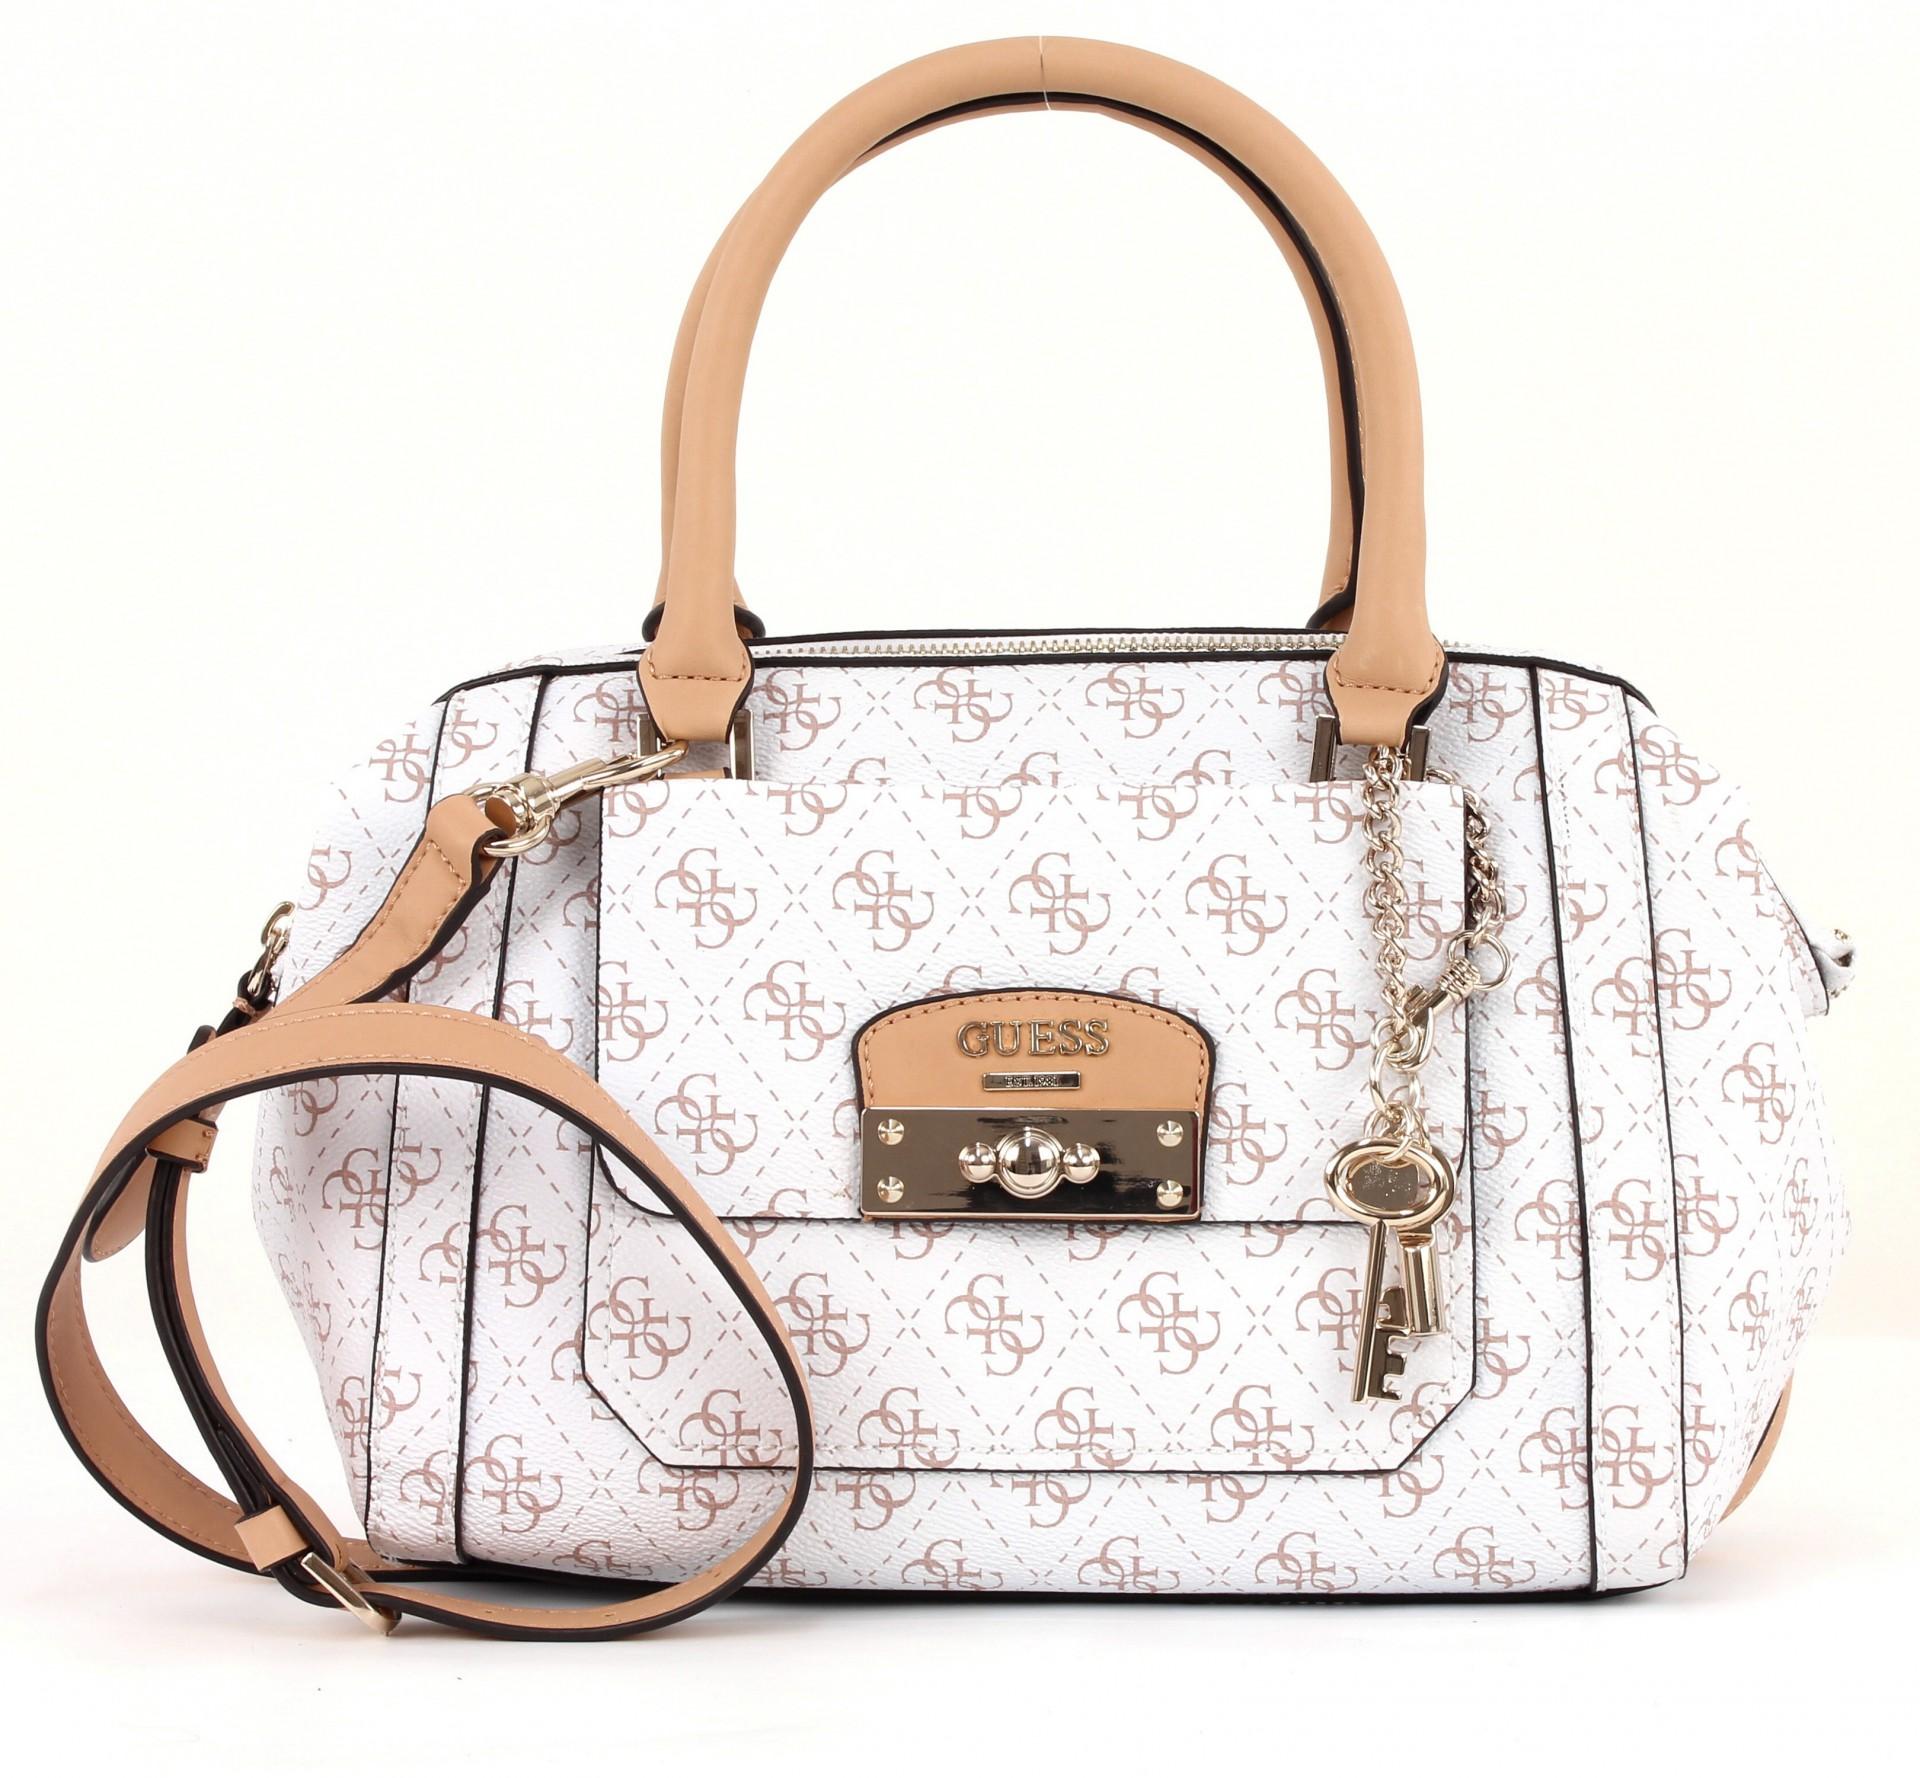 guess insider frame satchel tasche handtasche umh ngetasche damen weiss white ebay. Black Bedroom Furniture Sets. Home Design Ideas